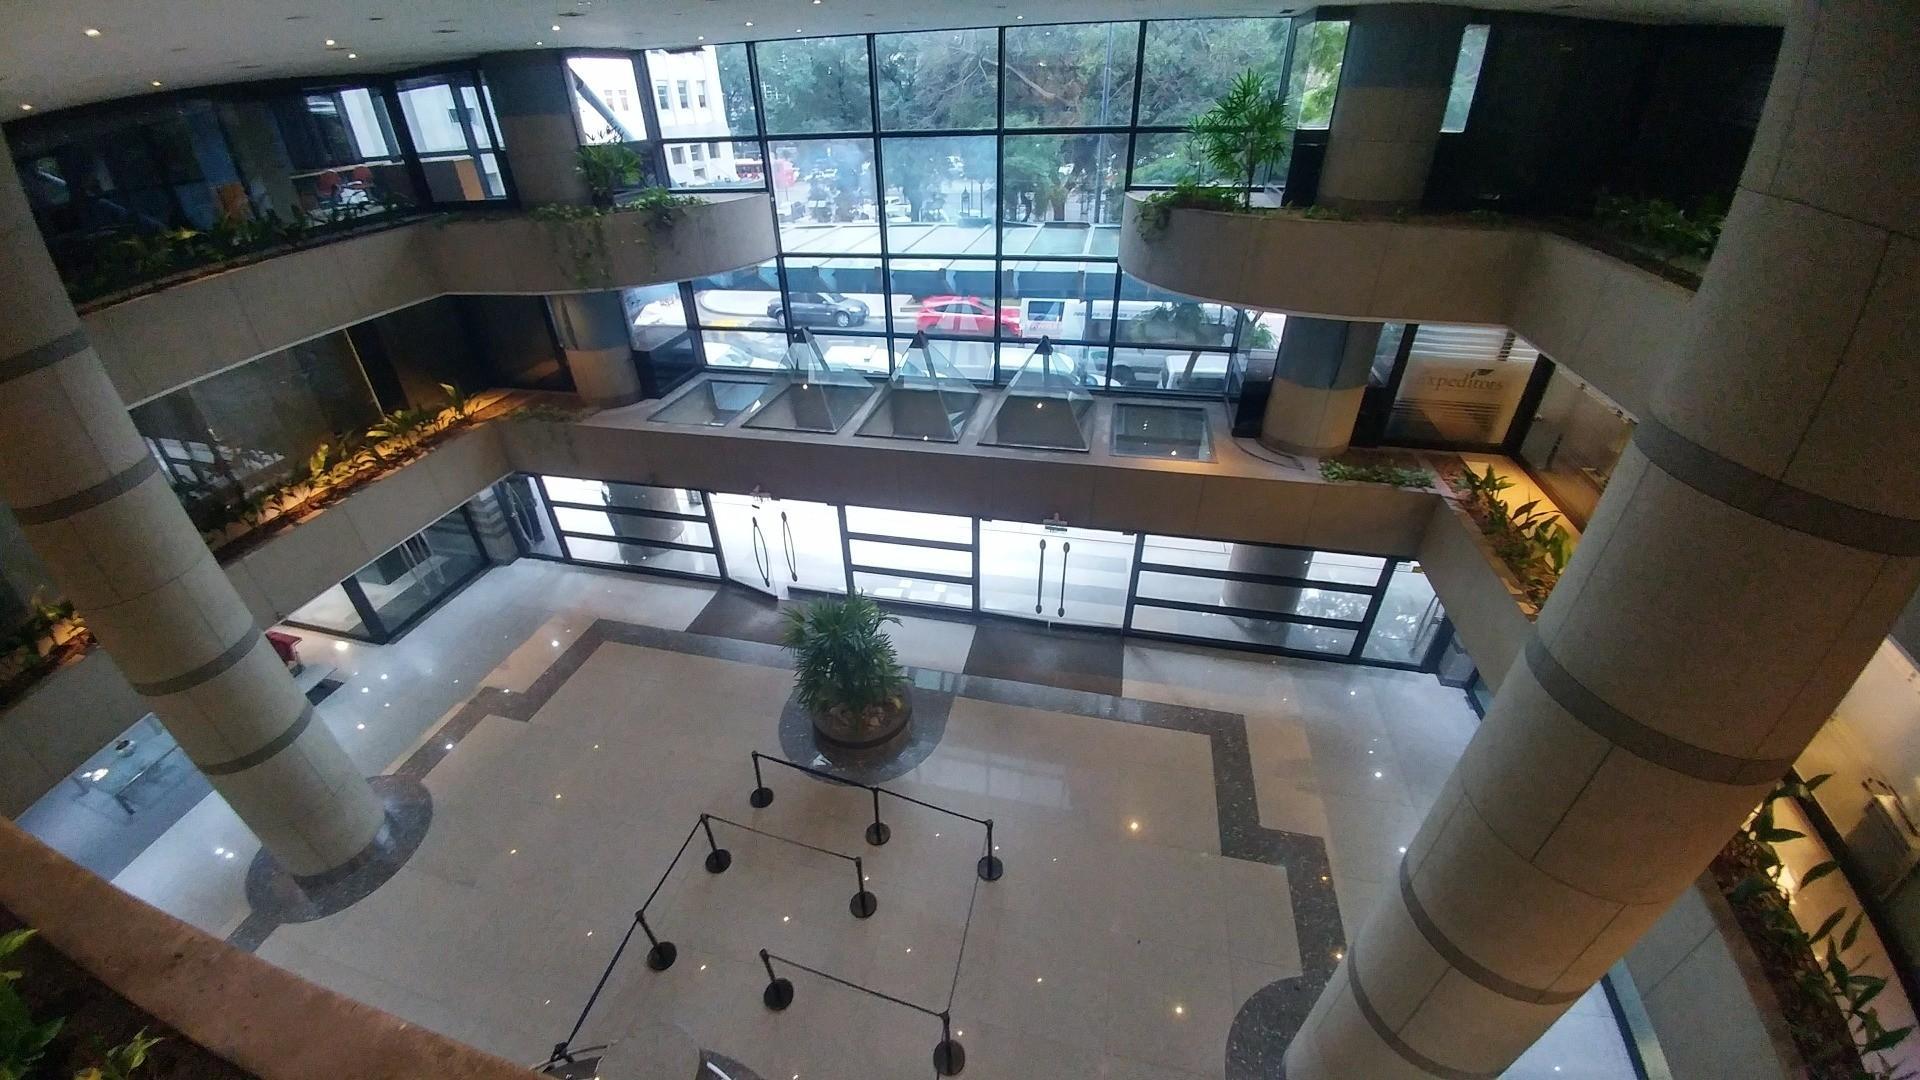 ESPECTACULAR OFICINA DE 64M2 EN EDIFICIO DE CATEGORIA. EXCELENTES VISTAS